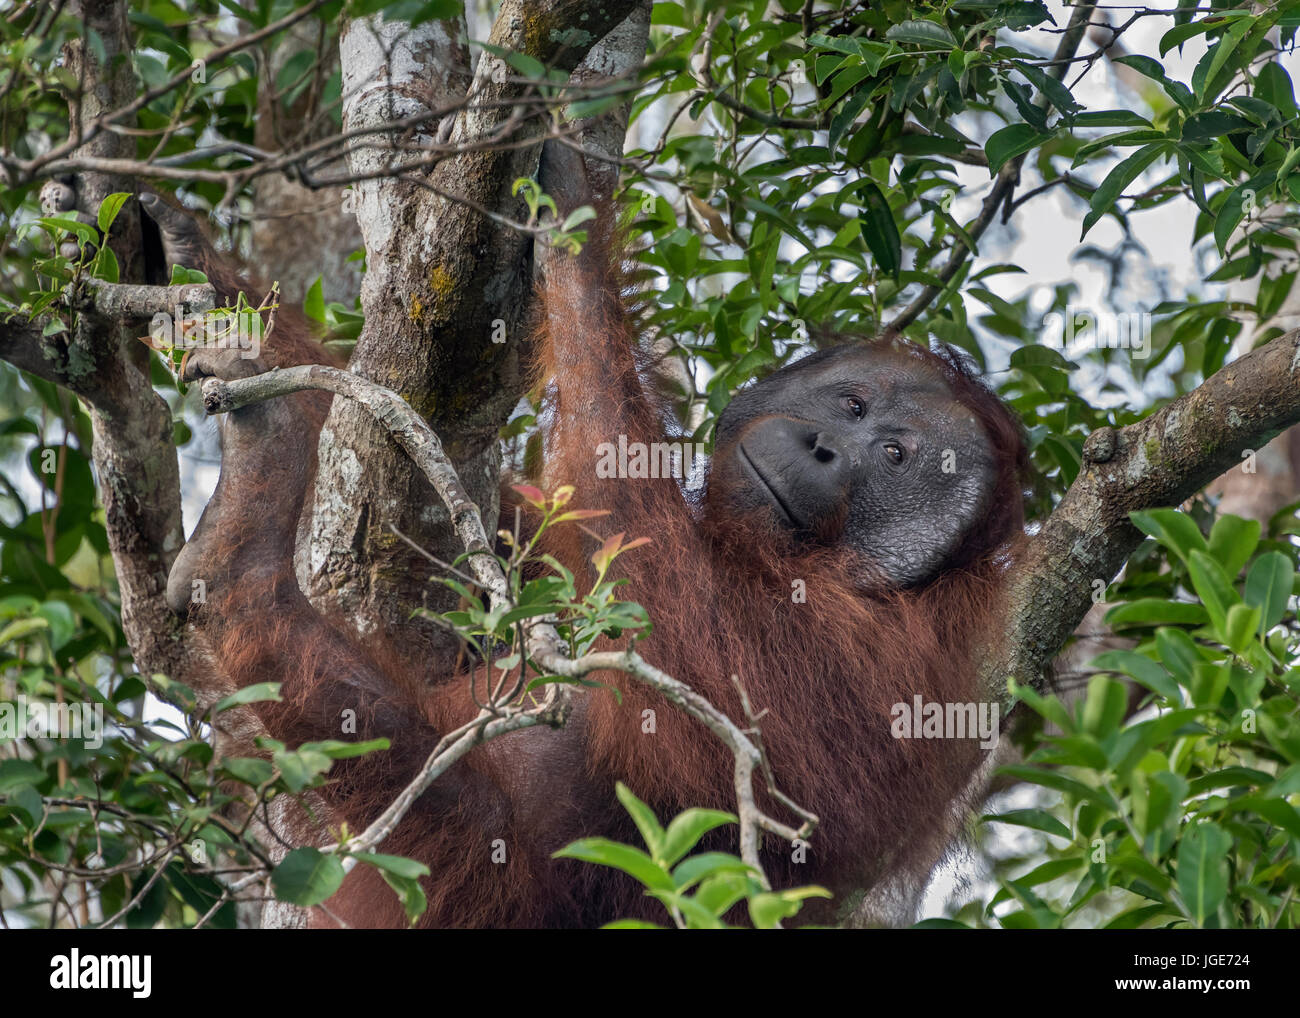 Smiling orangutan high in tree, Tanjung Puting National Park, Kalimantan, Indonesia Stock Photo